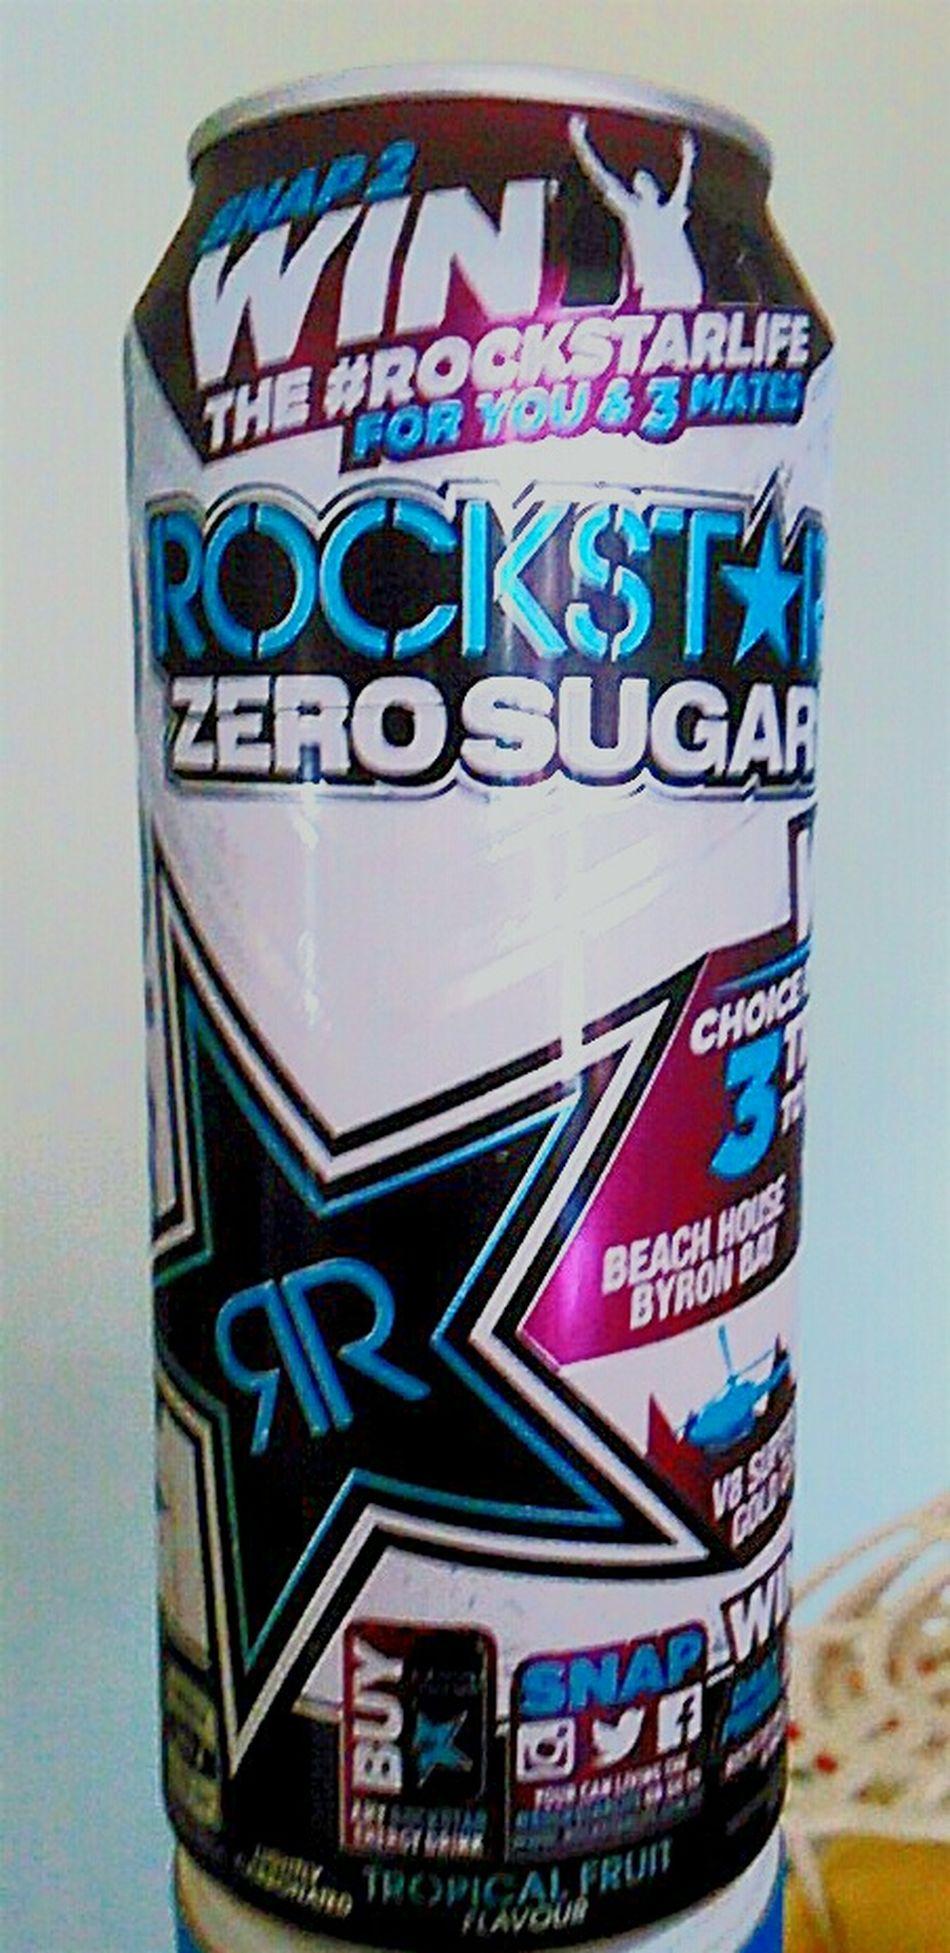 ROCKSTAR Energy Drinks Rockst☆r Rocks On Rockstarenergydrink ZeroSugar Rockstar Energy Rockst☆r Rockstar ☆ Rockstar Cans ROCKST☆R Energy Drink Rockst☆r Energy DrinksEnergyDrinkCans Energydrinks Rockstar Rocks OnRockstar Drink Cans Rockstar Energy Drink Energydrink Energy Drink ROCKST☆R Zero Sugar Rockstarenergy Drink Cans Drinkcans Drink Can Energy Drink Cans Energy Drinks